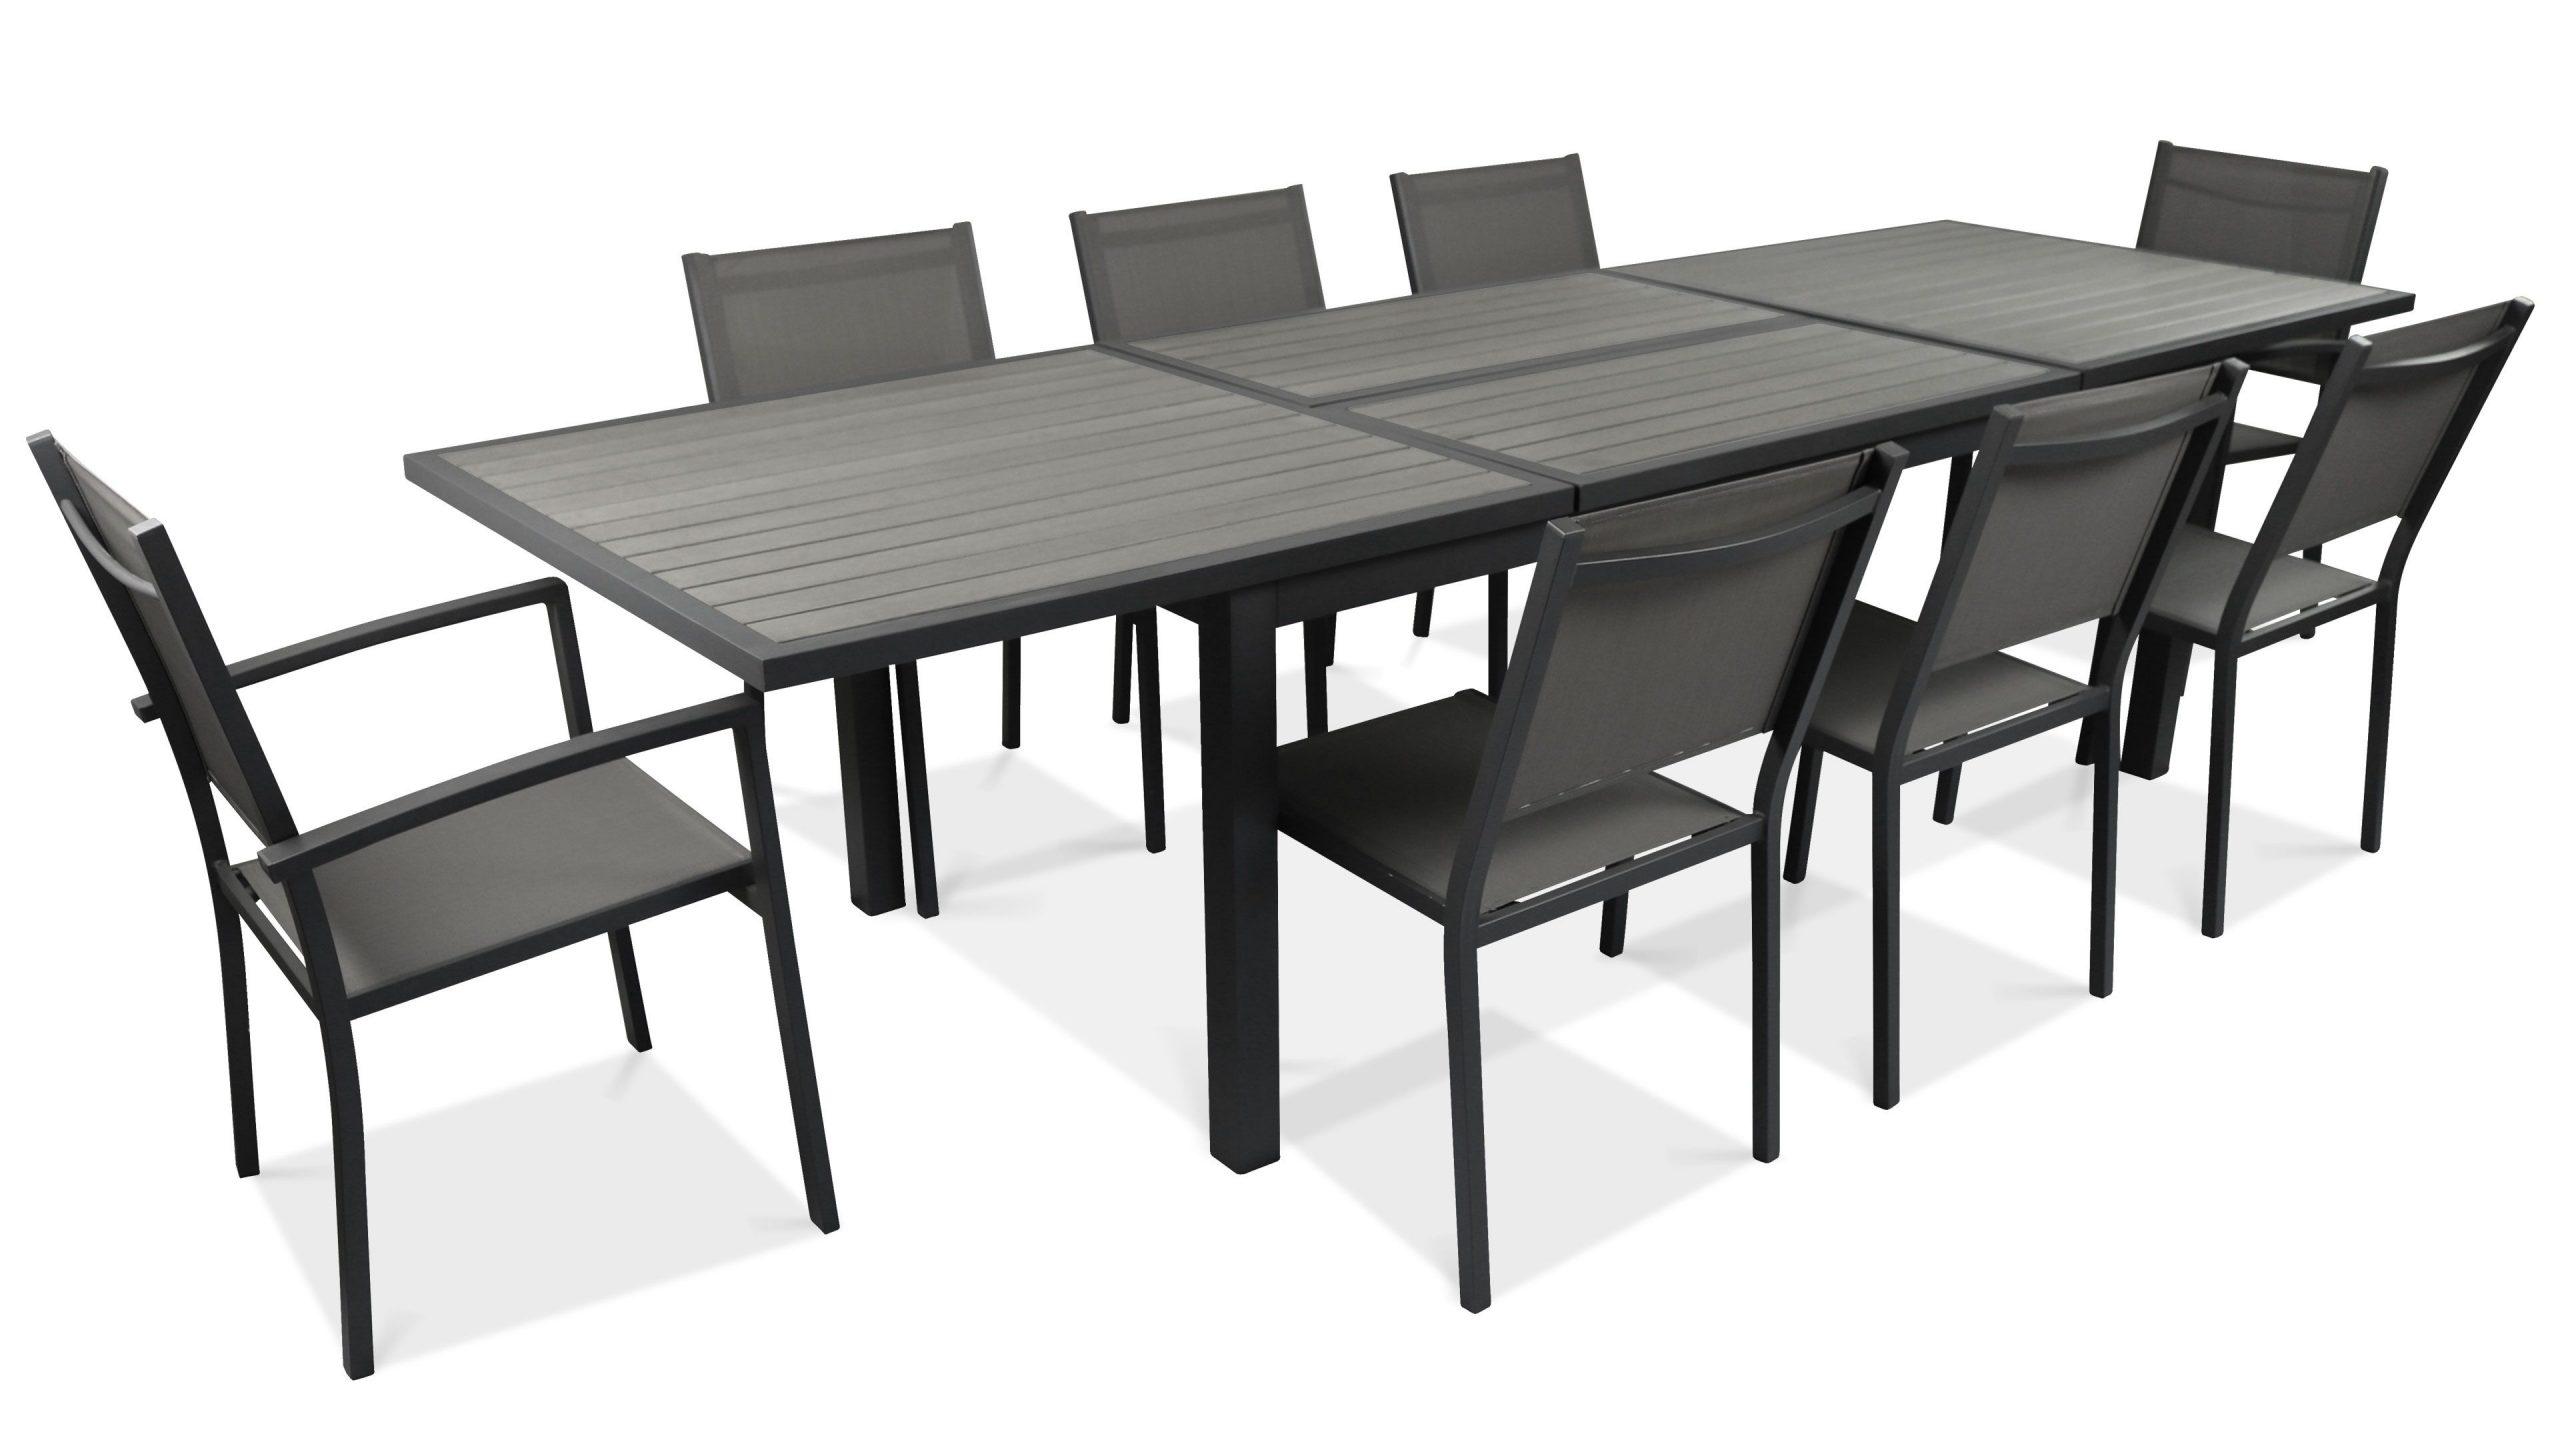 Salon Table De Jardin Extensible 10 Places avec Table Jardin Aluminium Avec Rallonge